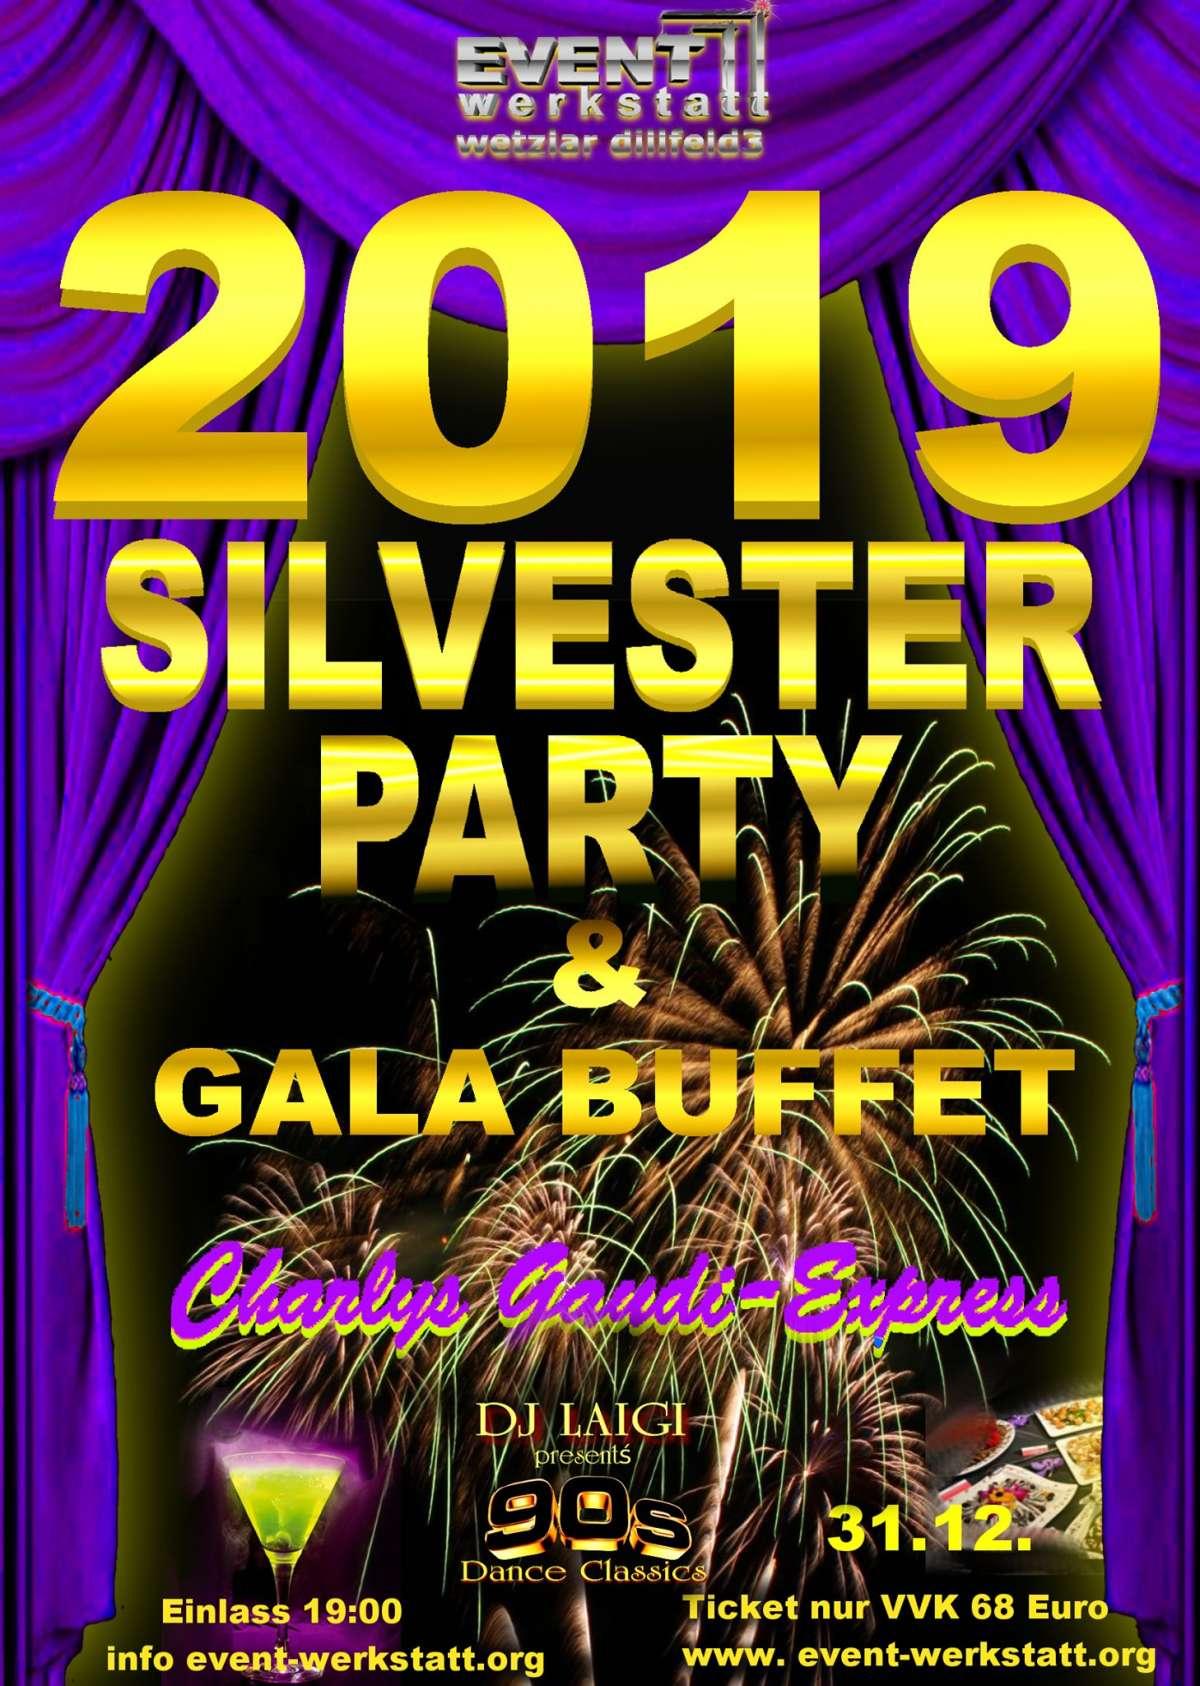 2019 Silvester-Party - Event Werkstatt  - Wetzlar